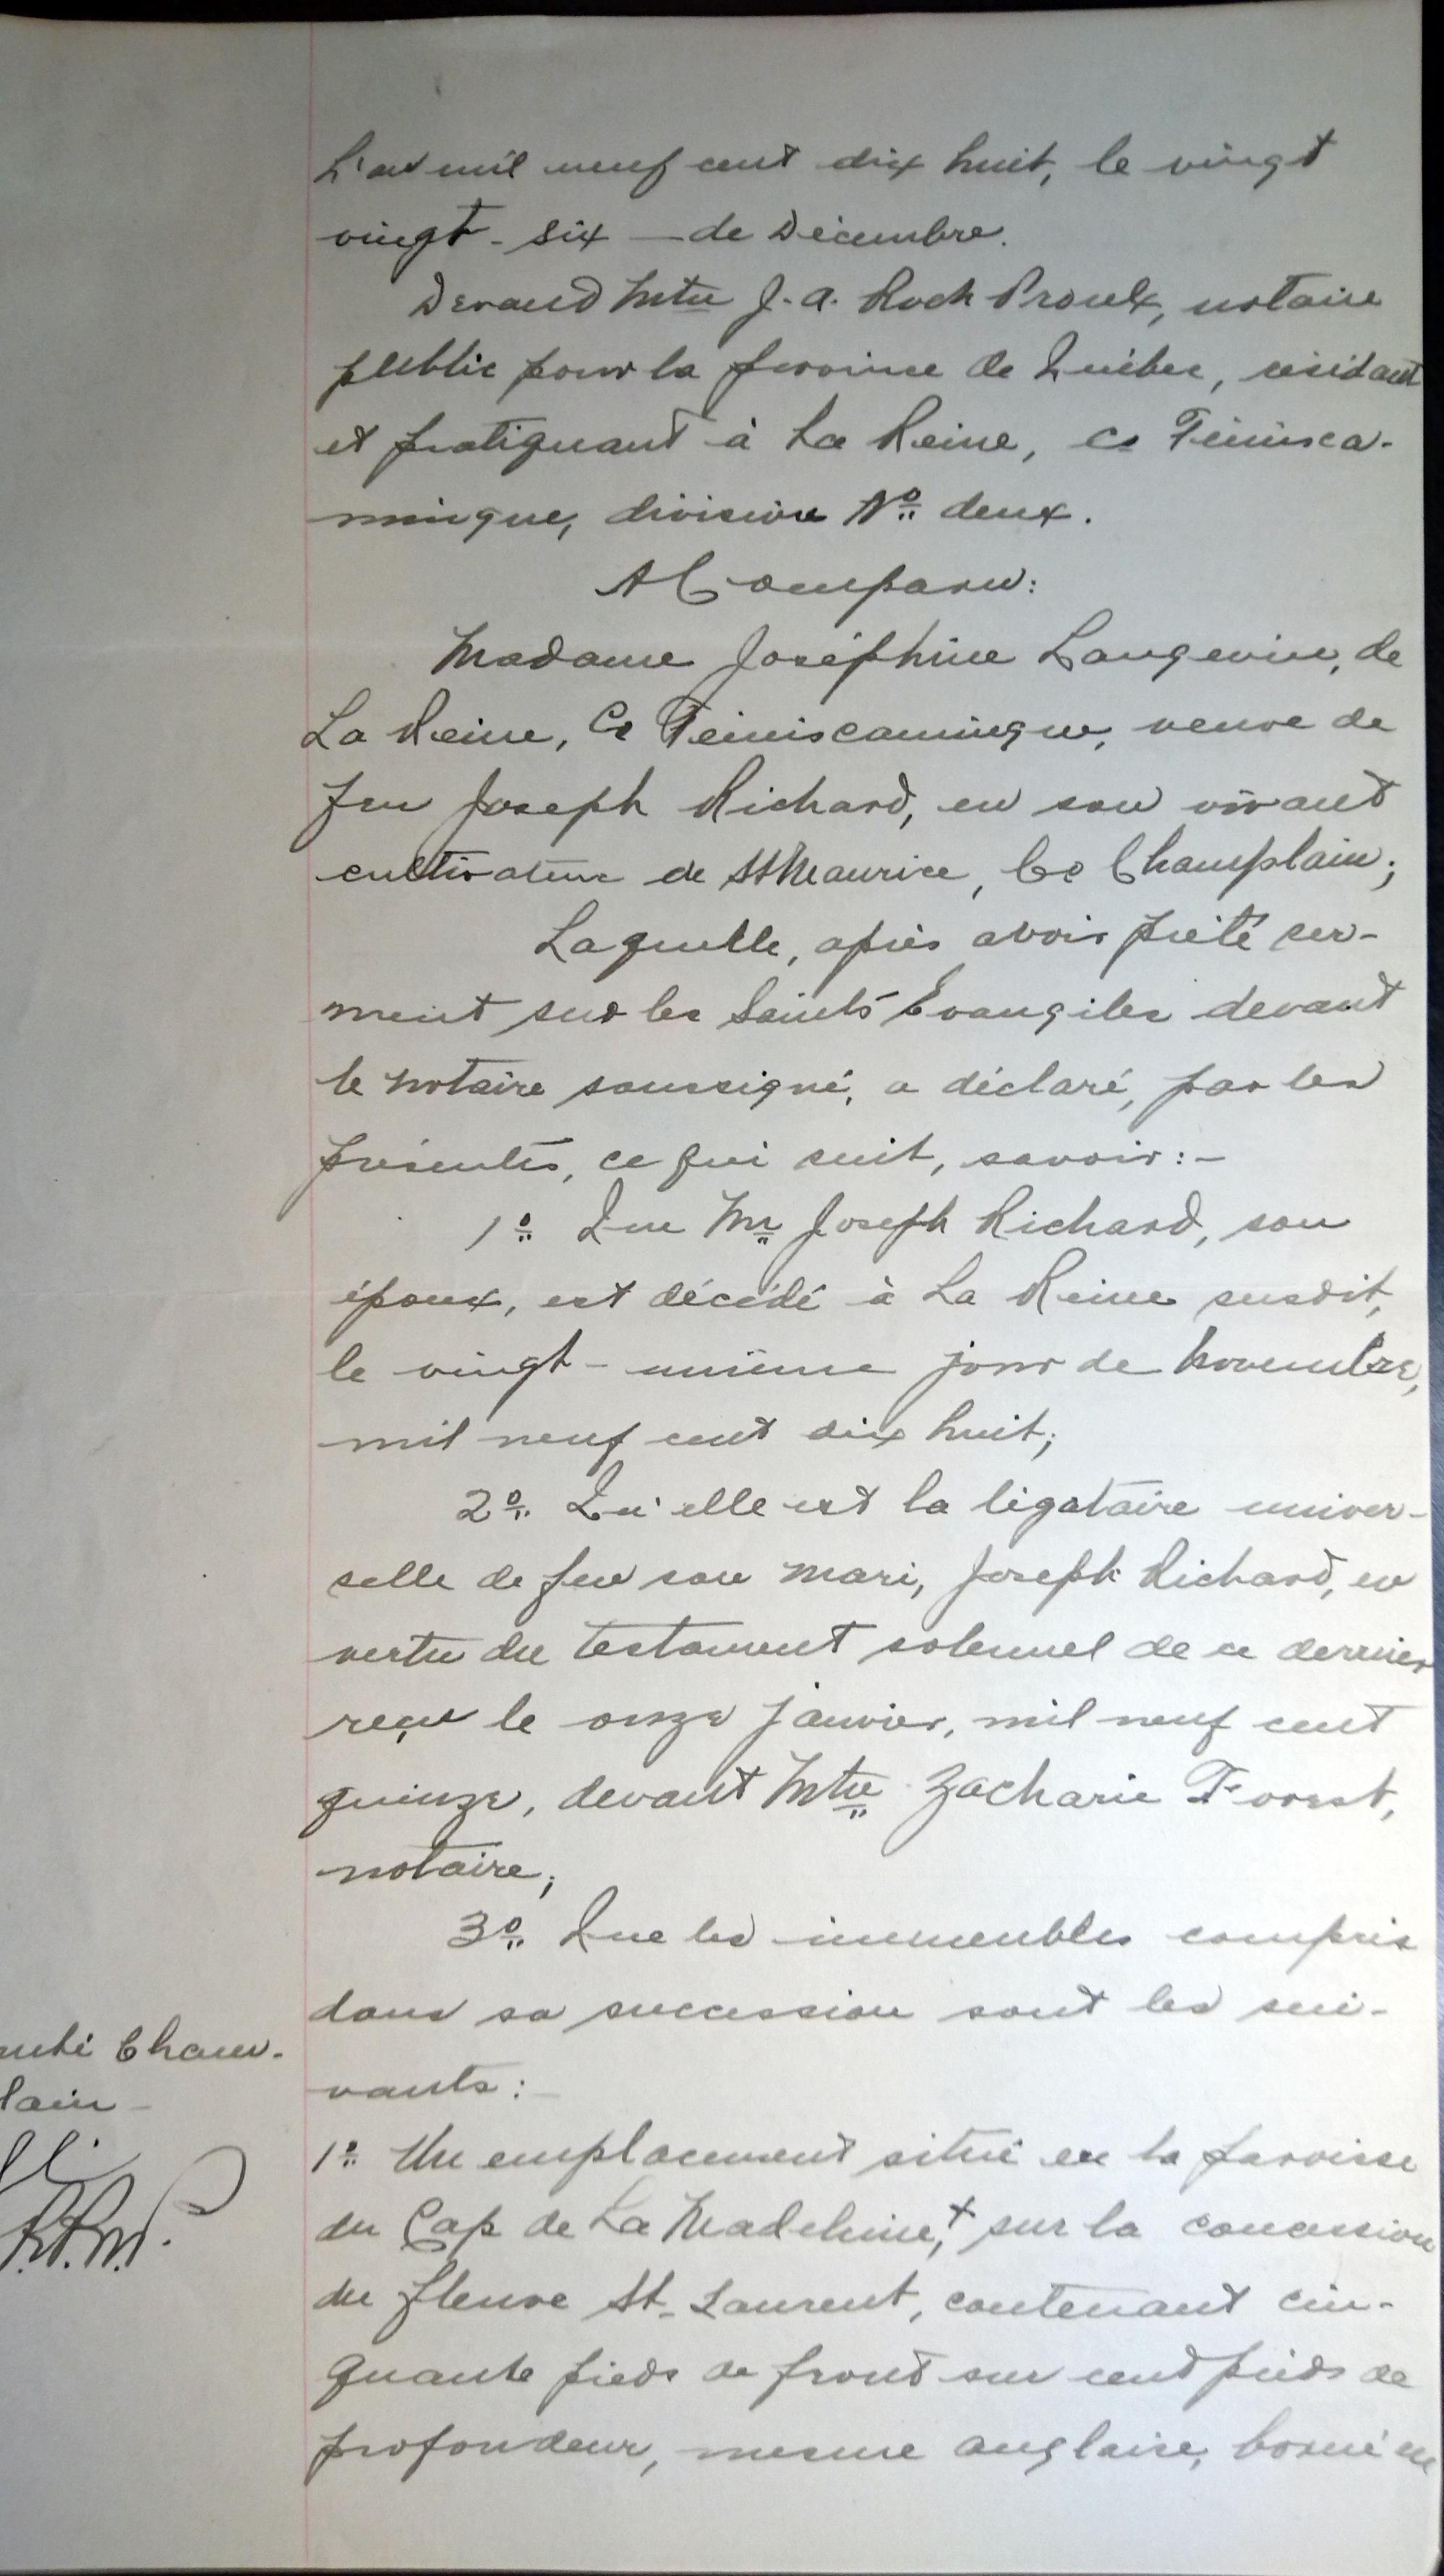 0687 1918-12-26A